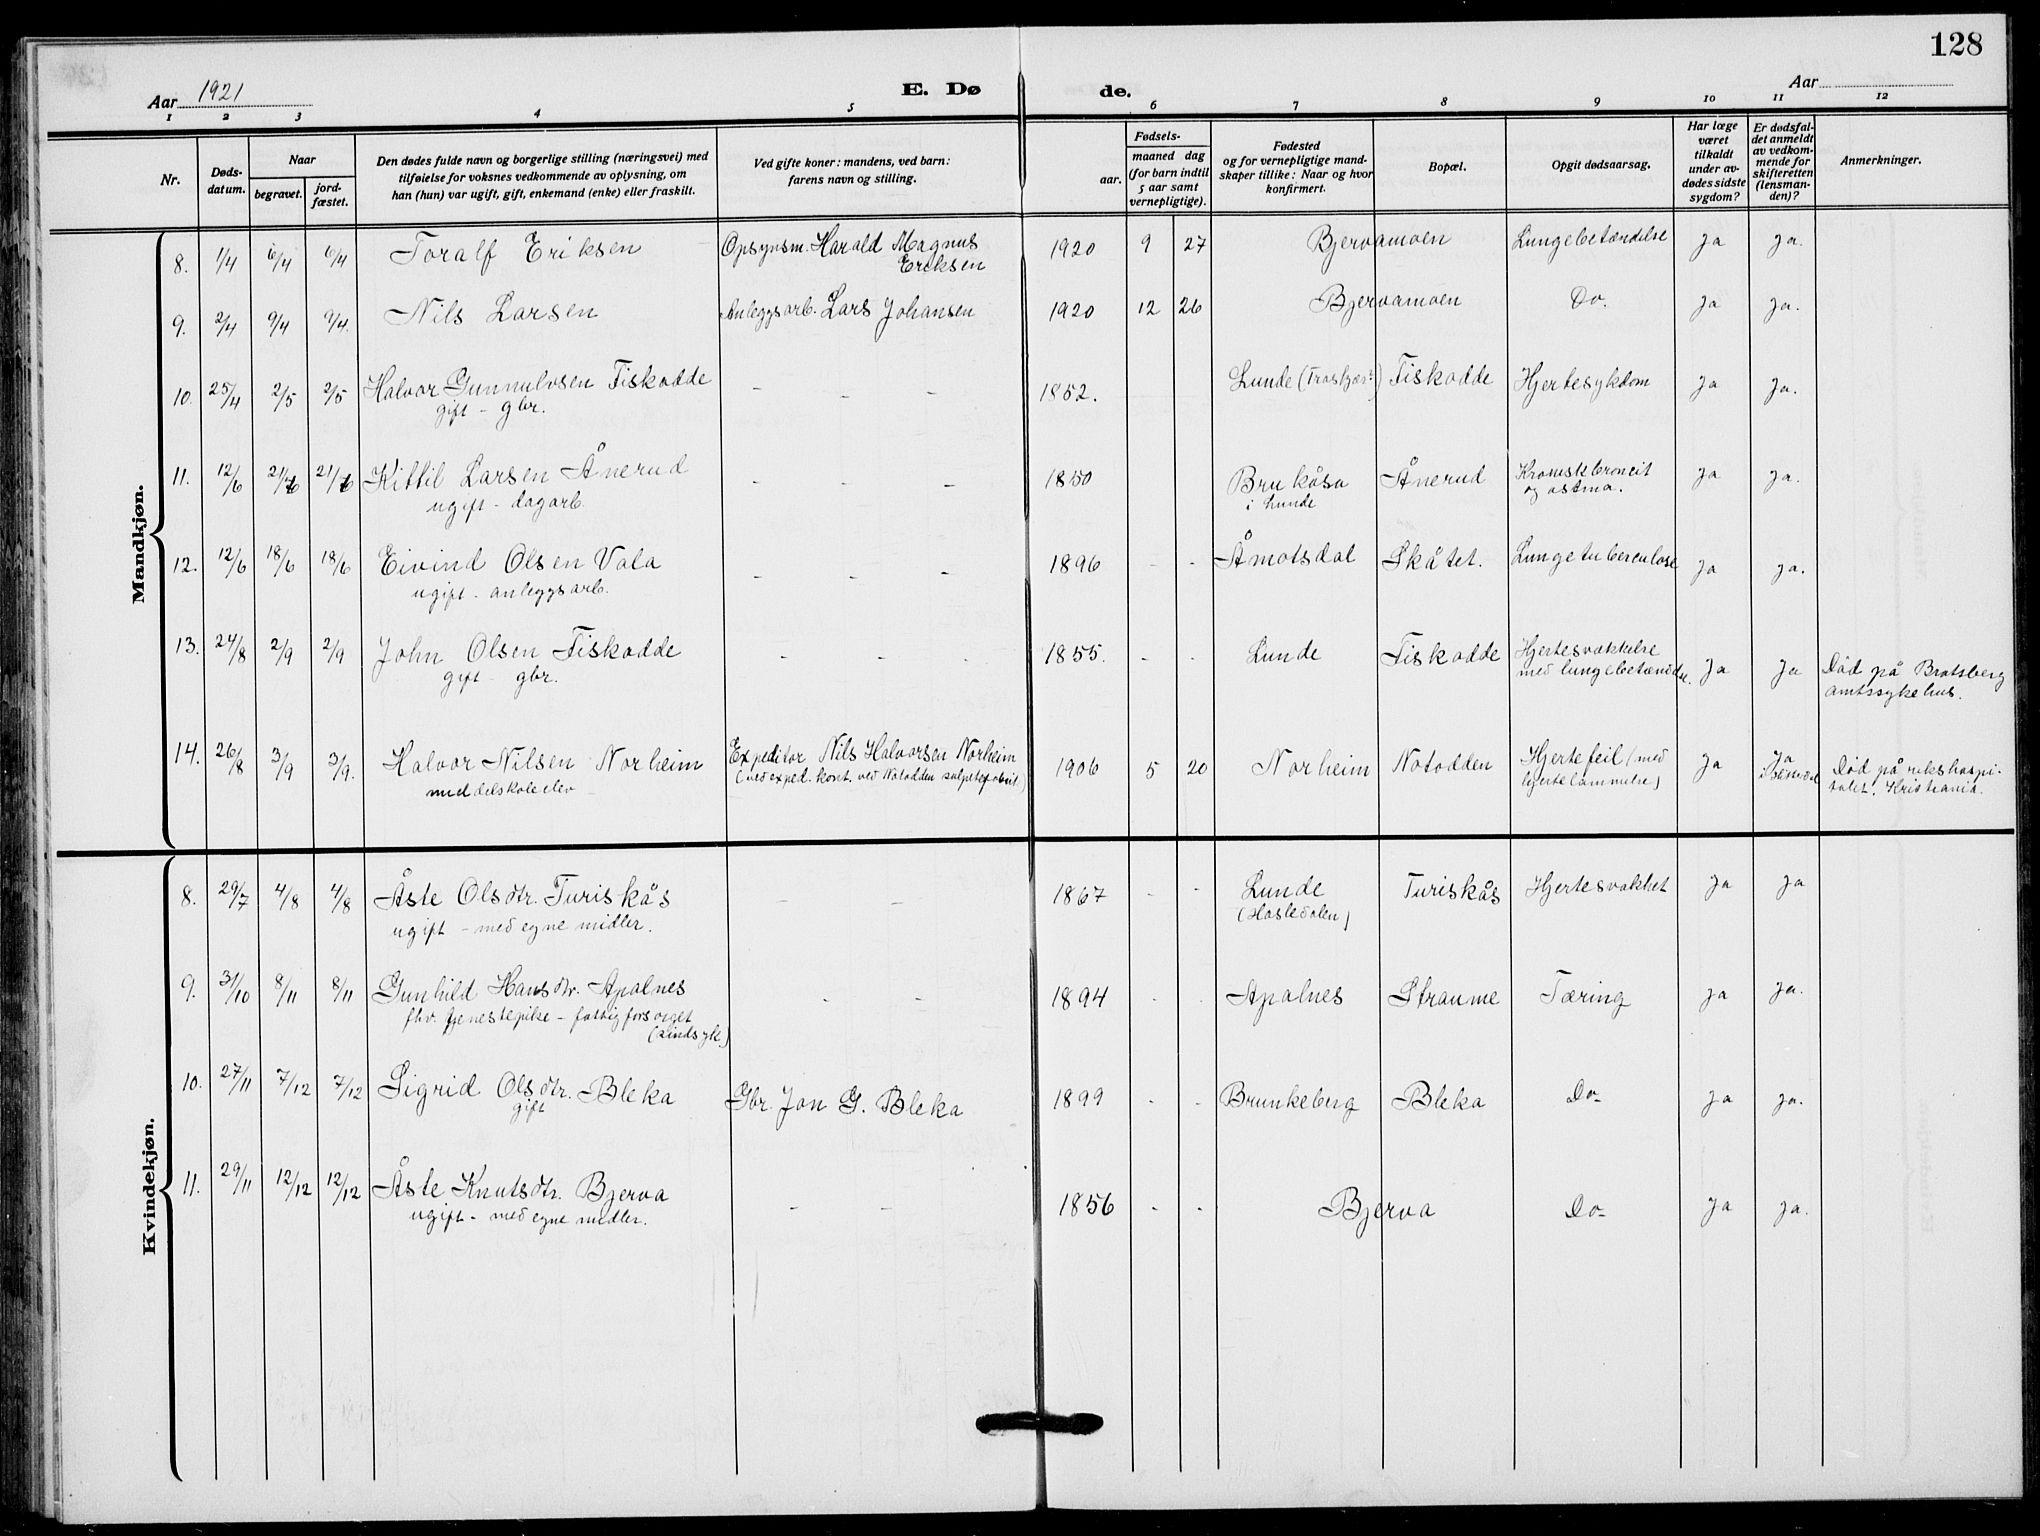 SAKO, Lunde kirkebøker, F/Fa/L0005: Ministerialbok nr. I 5, 1914-1922, s. 128